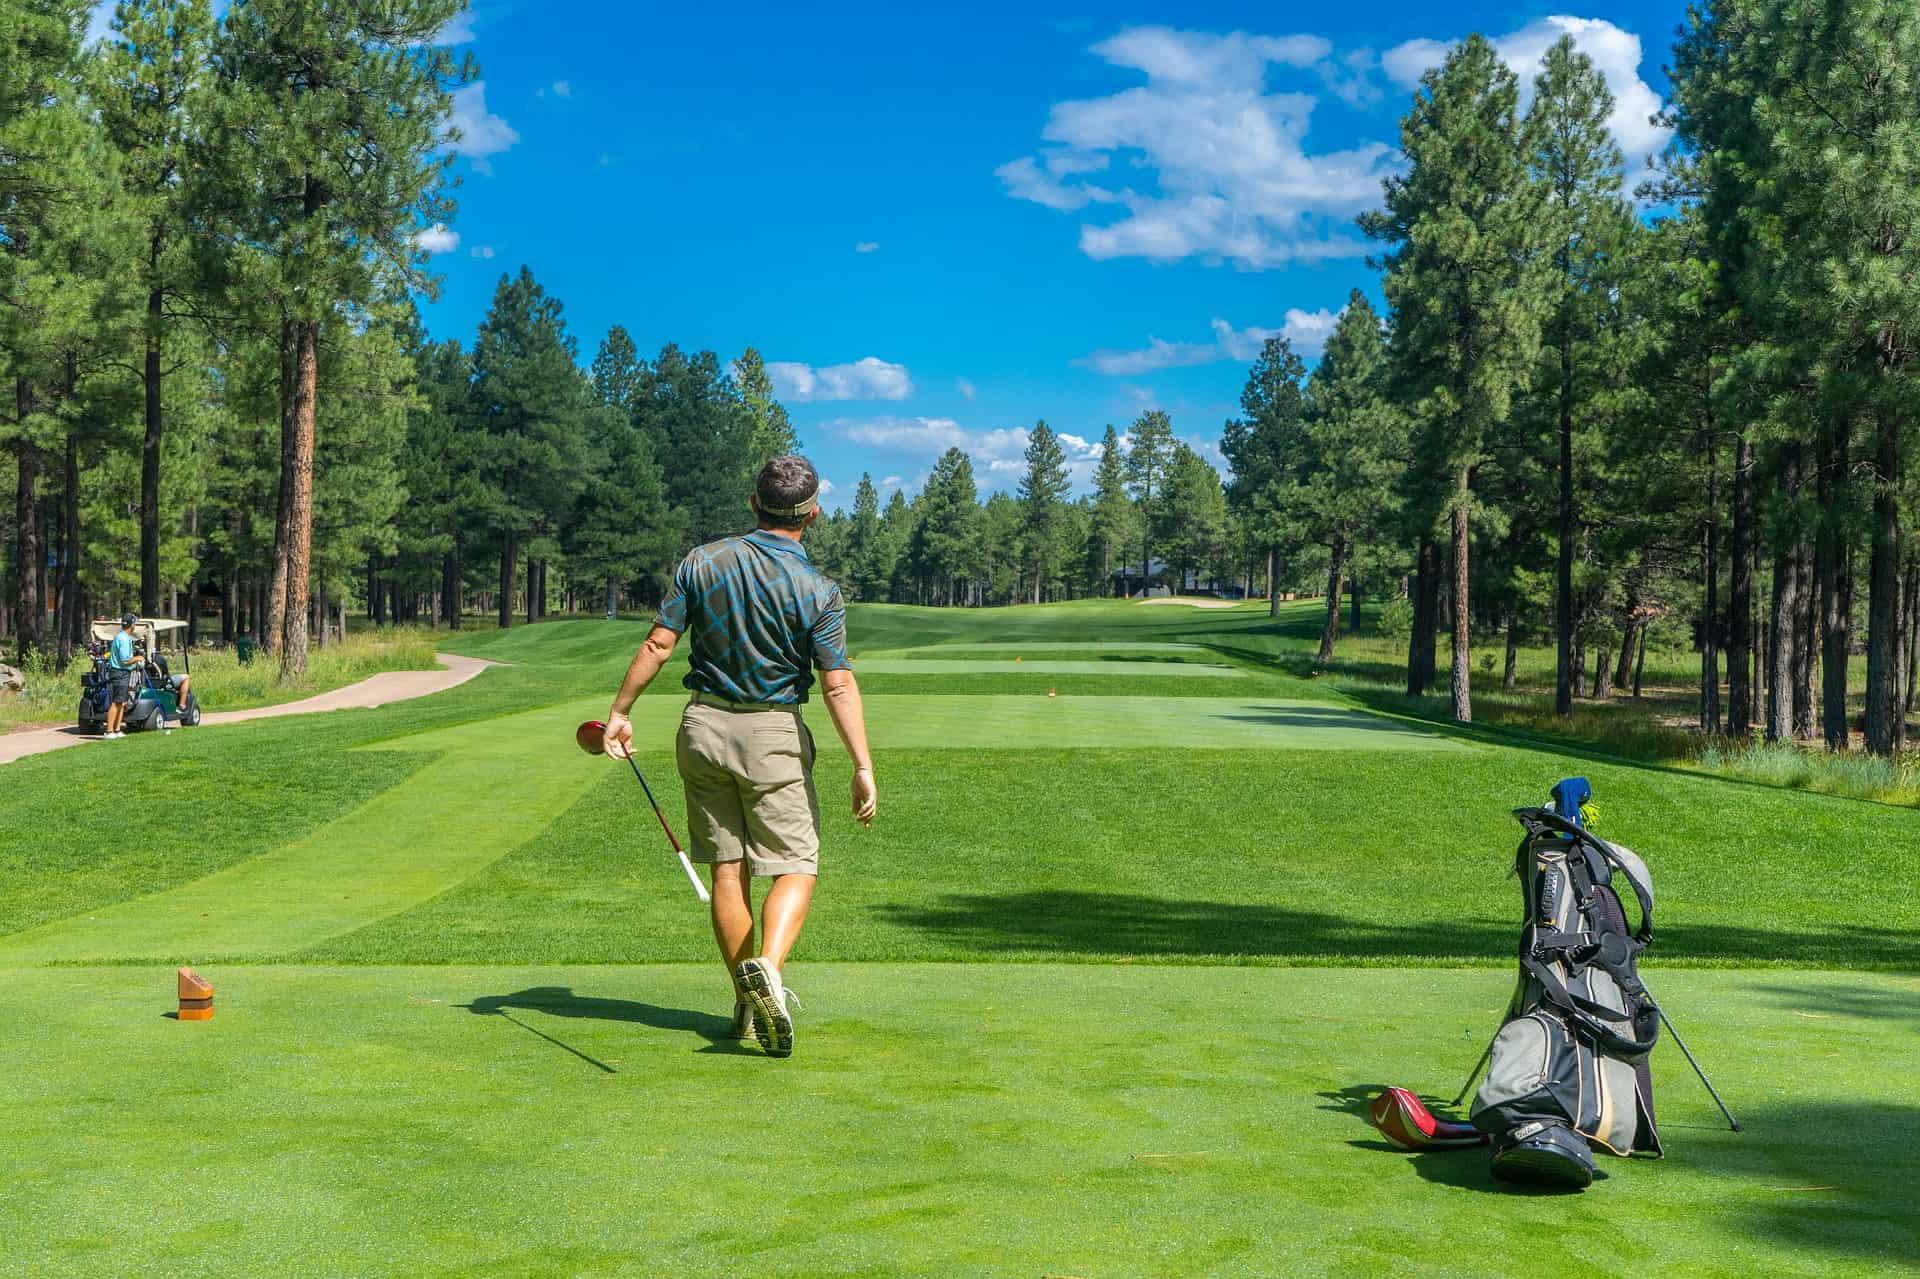 10000 hours-golf-dan plan-expert performance